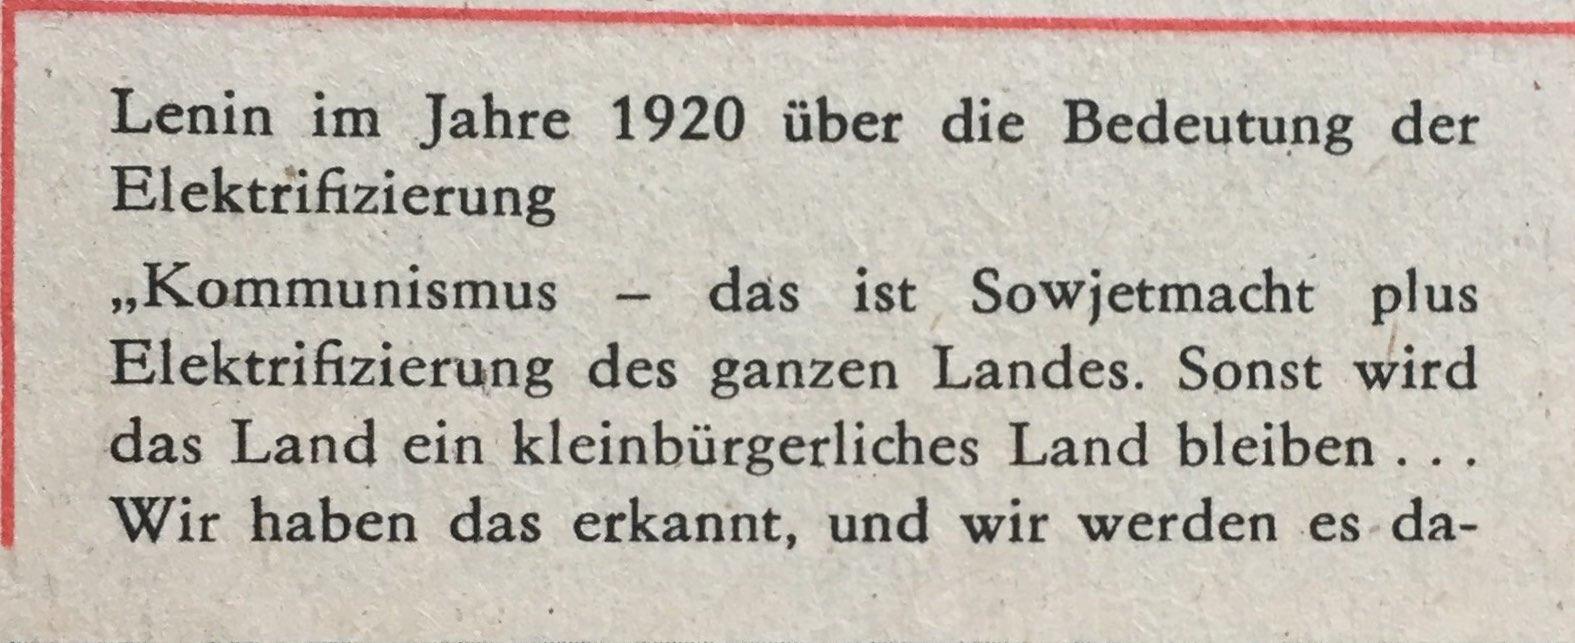 Lenin zu Elektrifizierung 1920